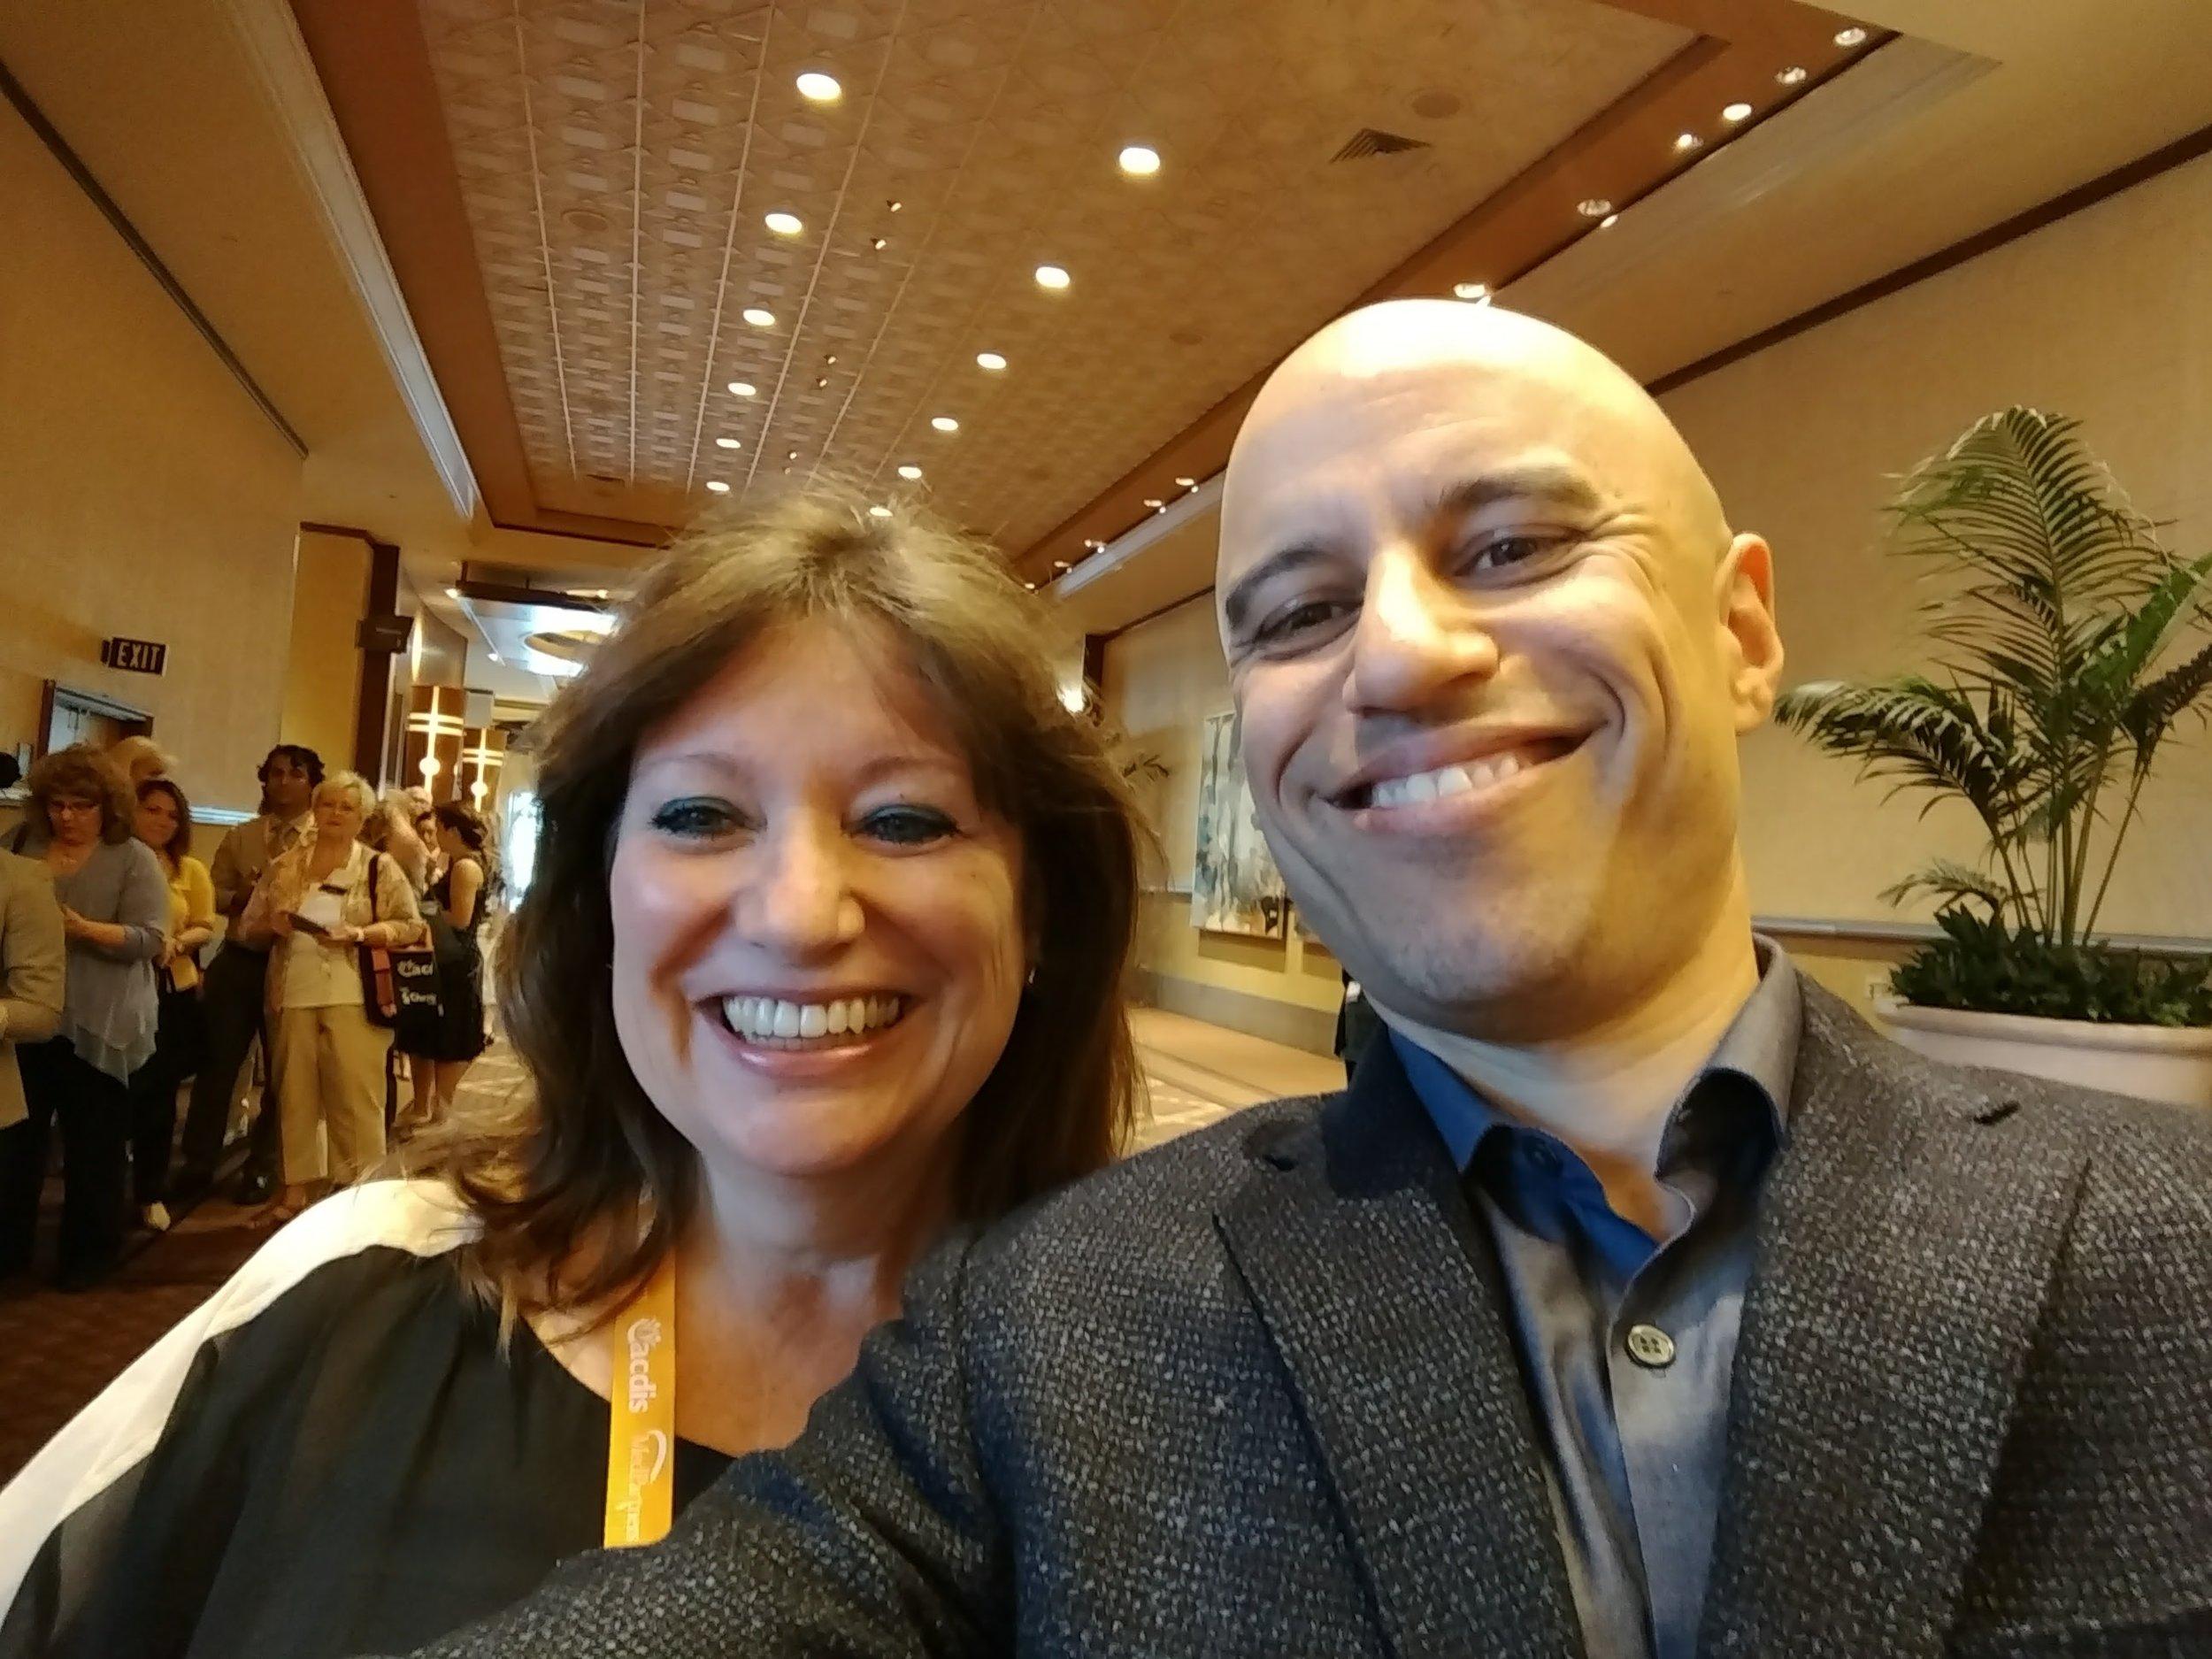 Claudia Logan and Dr. Zubin Damania AKA ZDoggMD